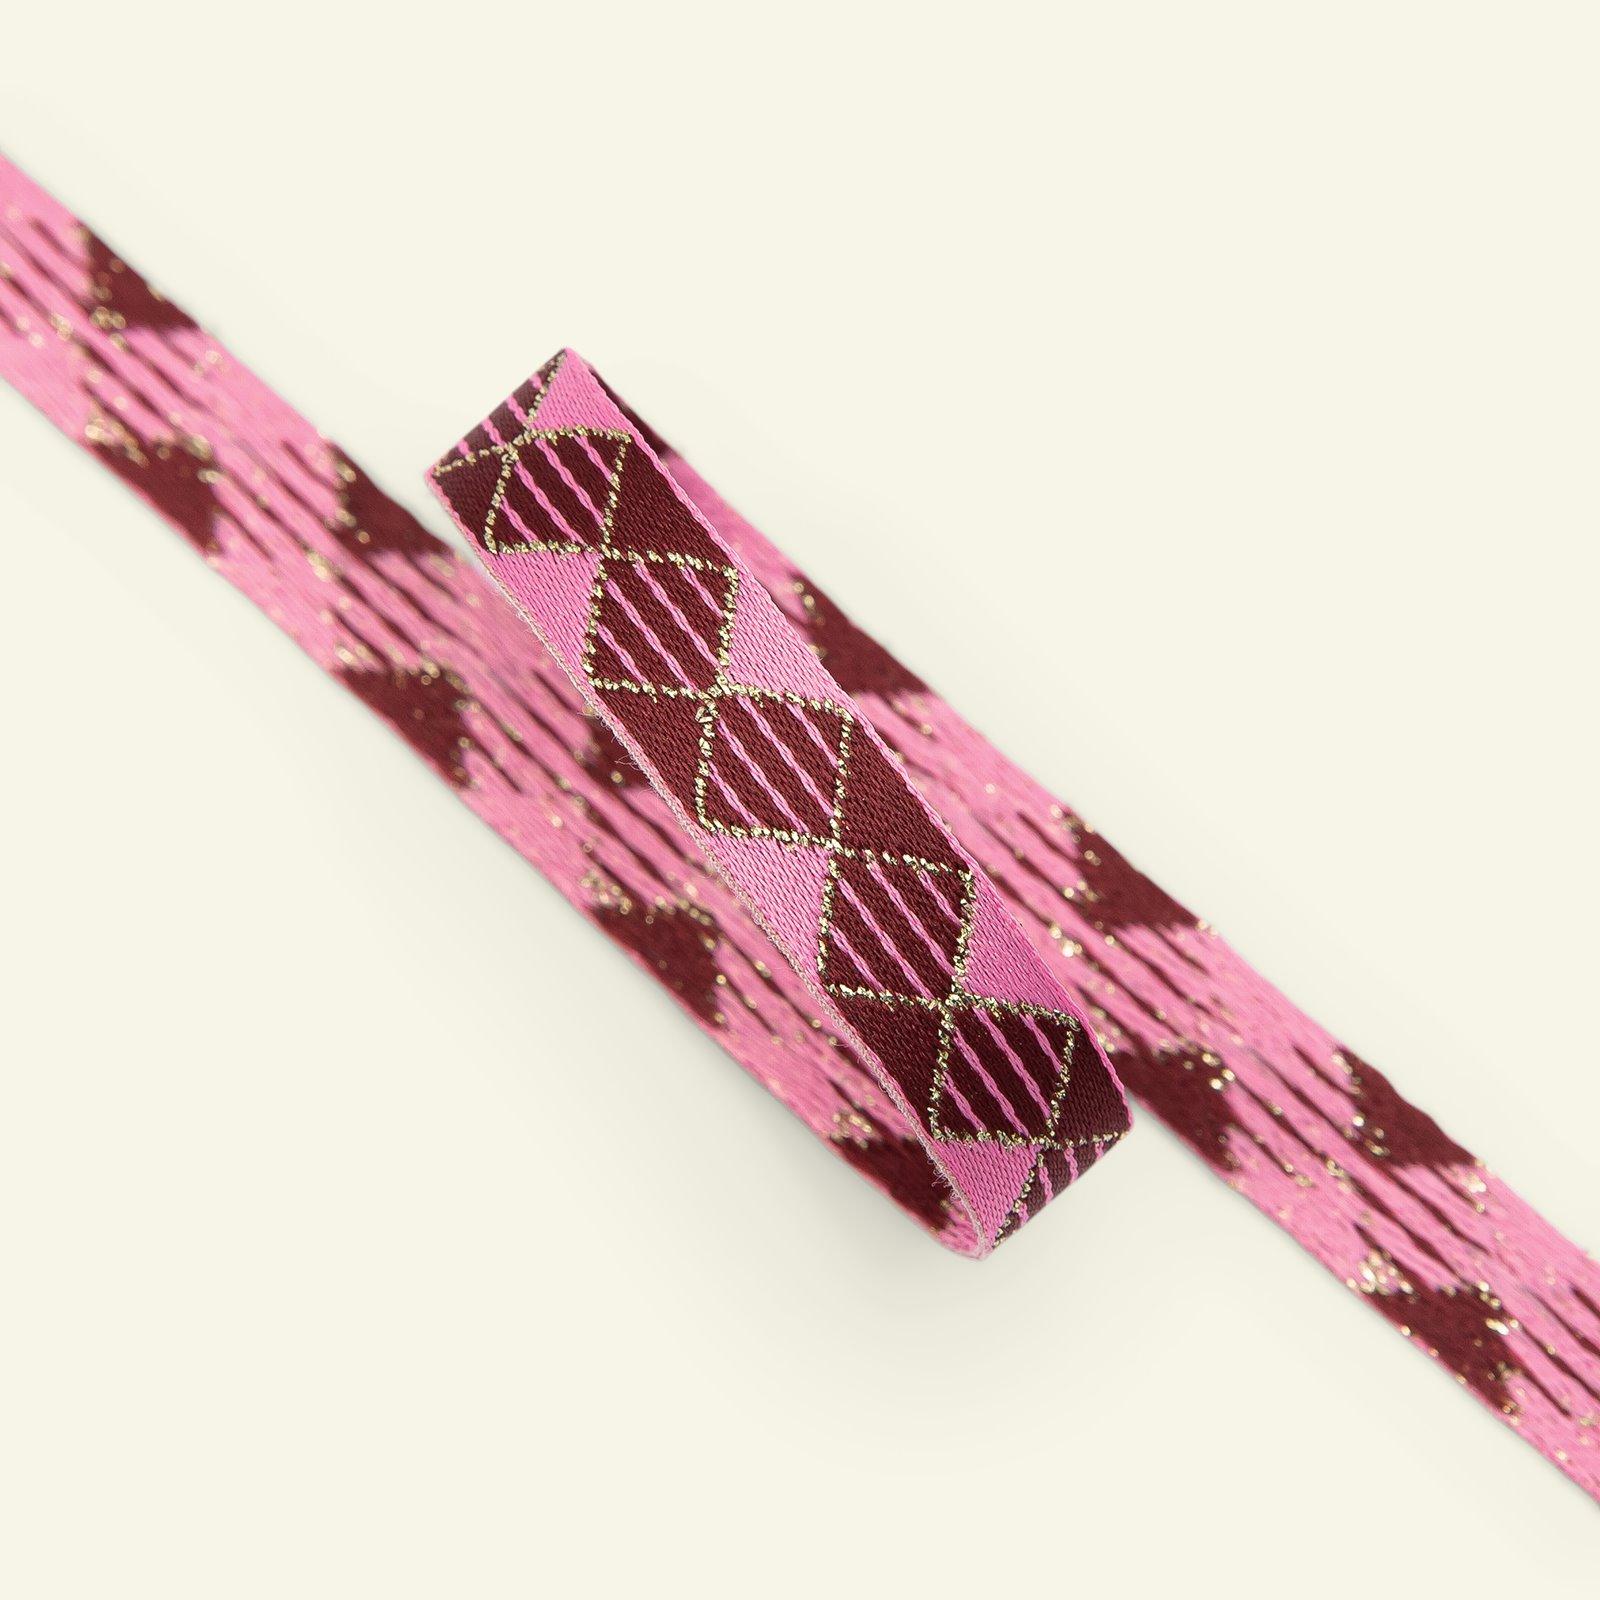 Ribbon woven 12mm pink/bordeaux 3m 22360_pack